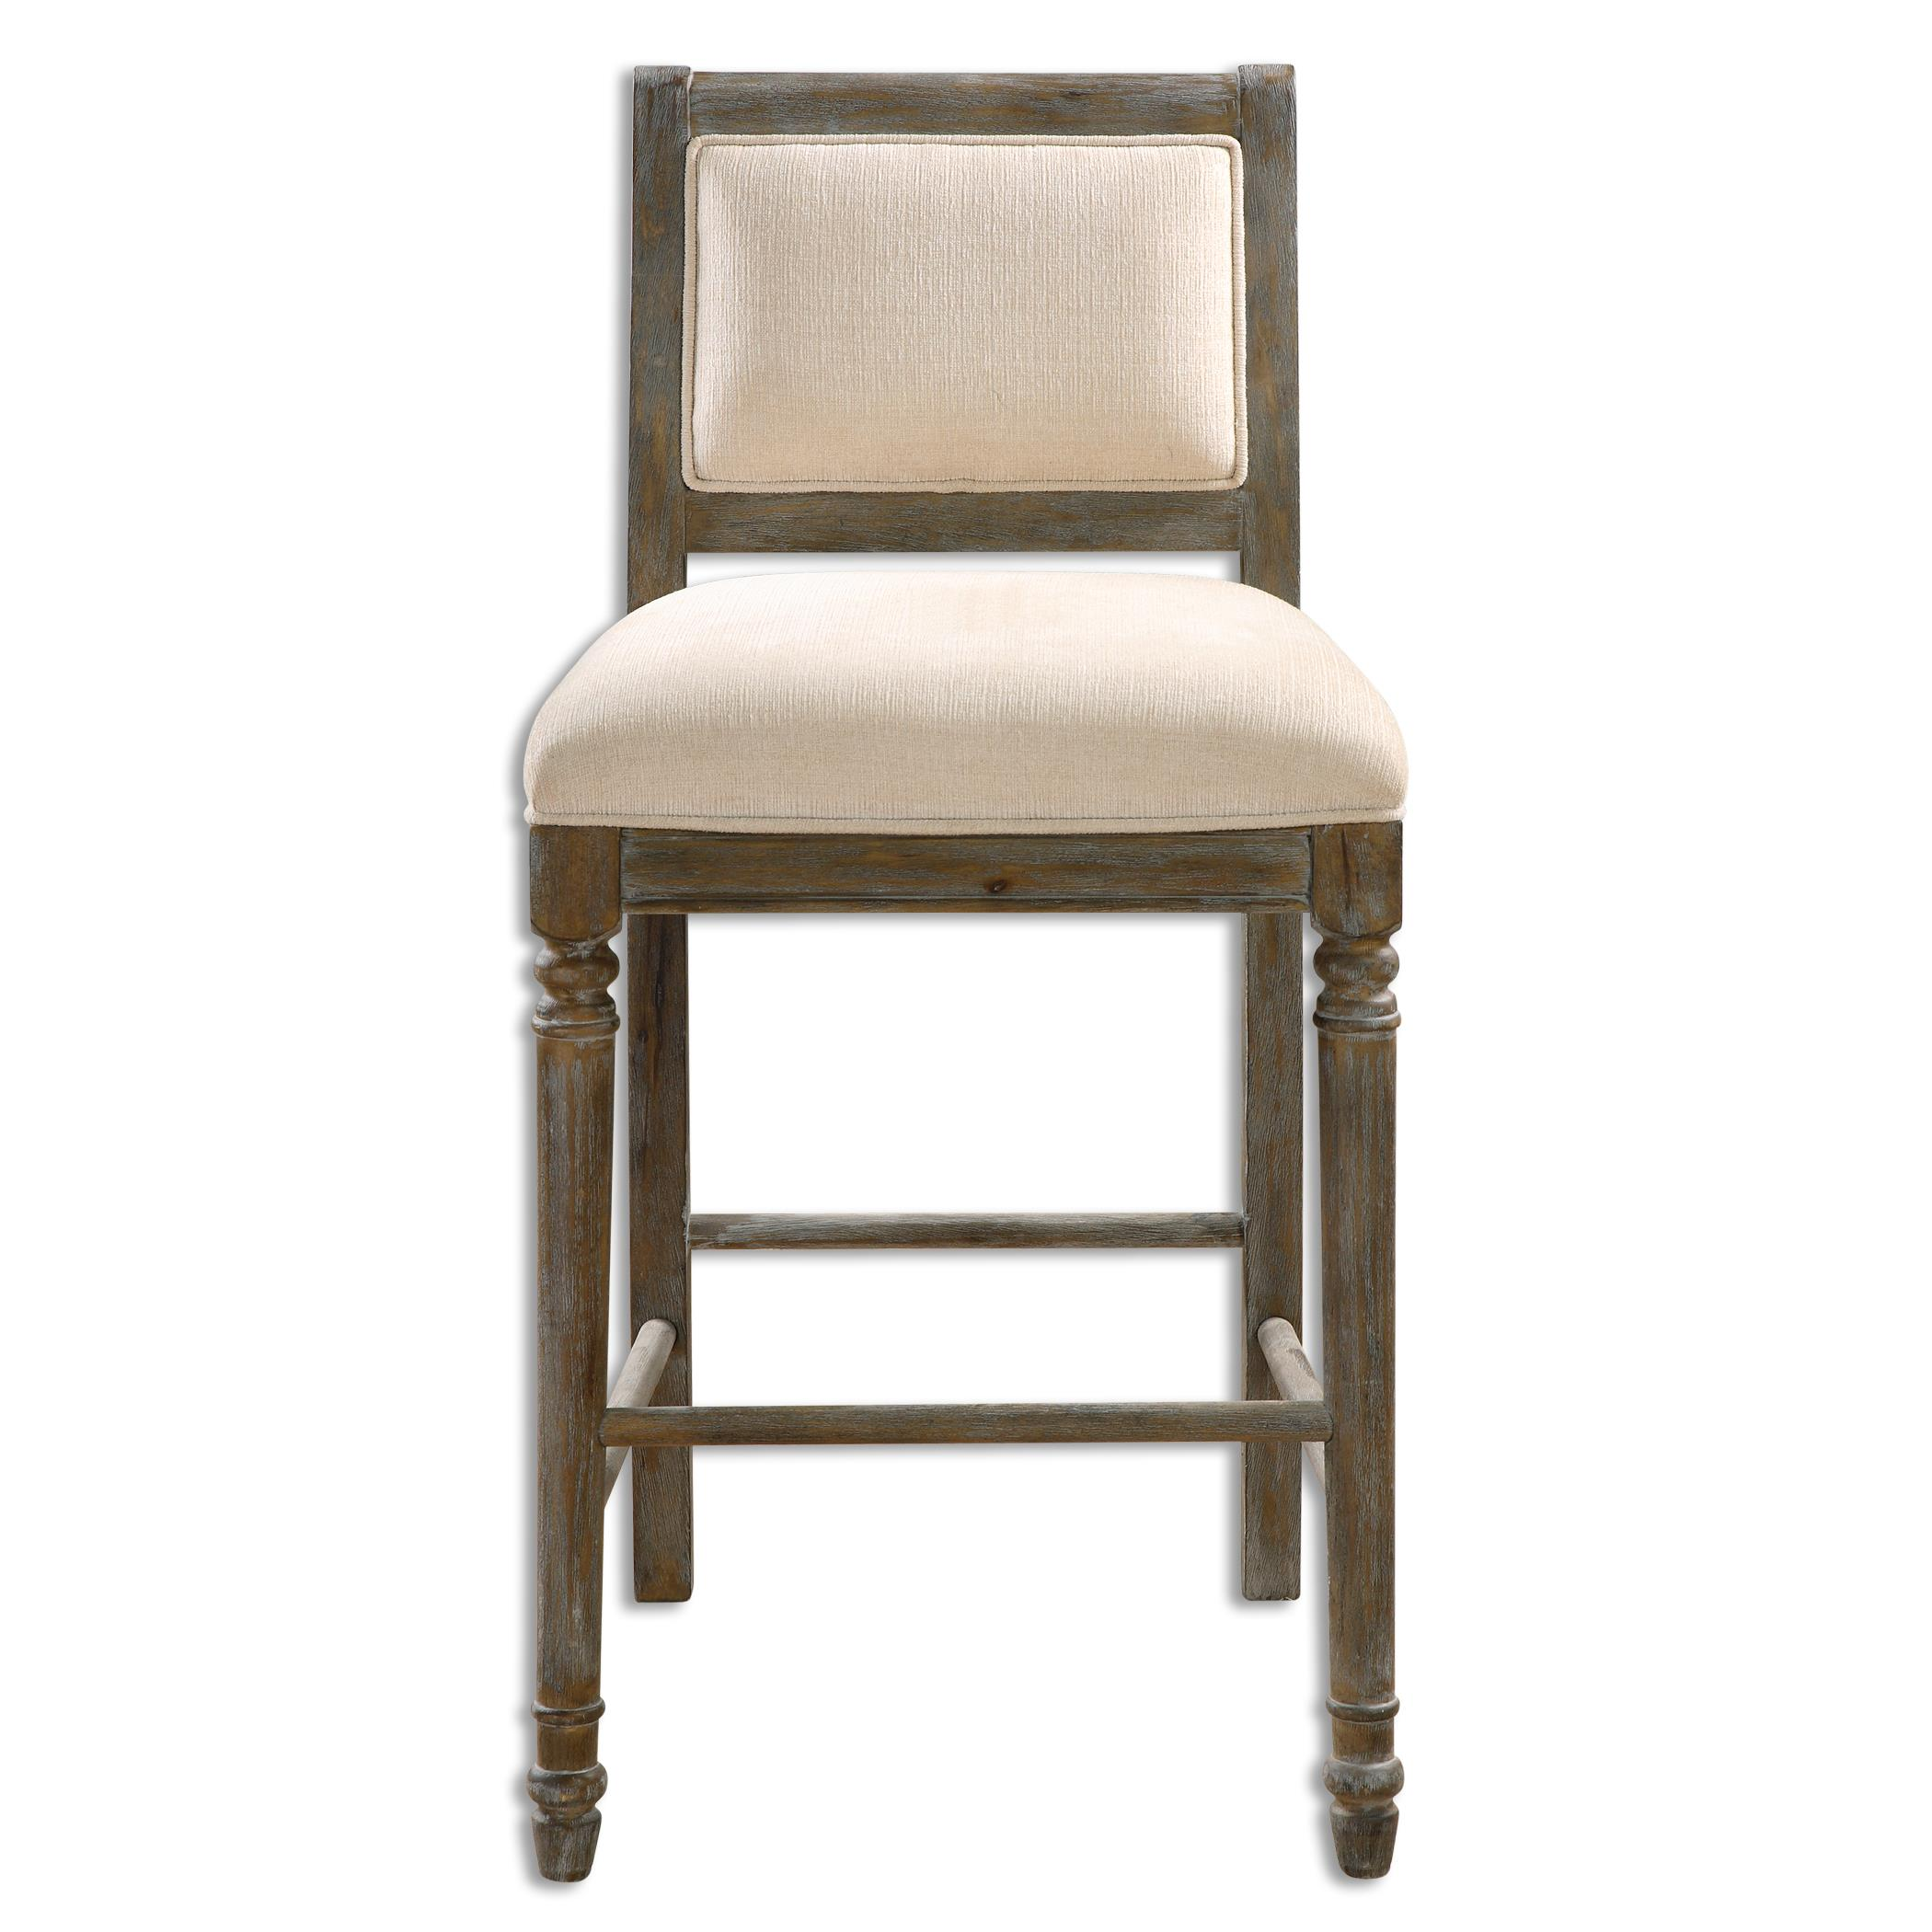 Uttermost Accent Furniture Runako Chenille Barstool - Item Number: 23213